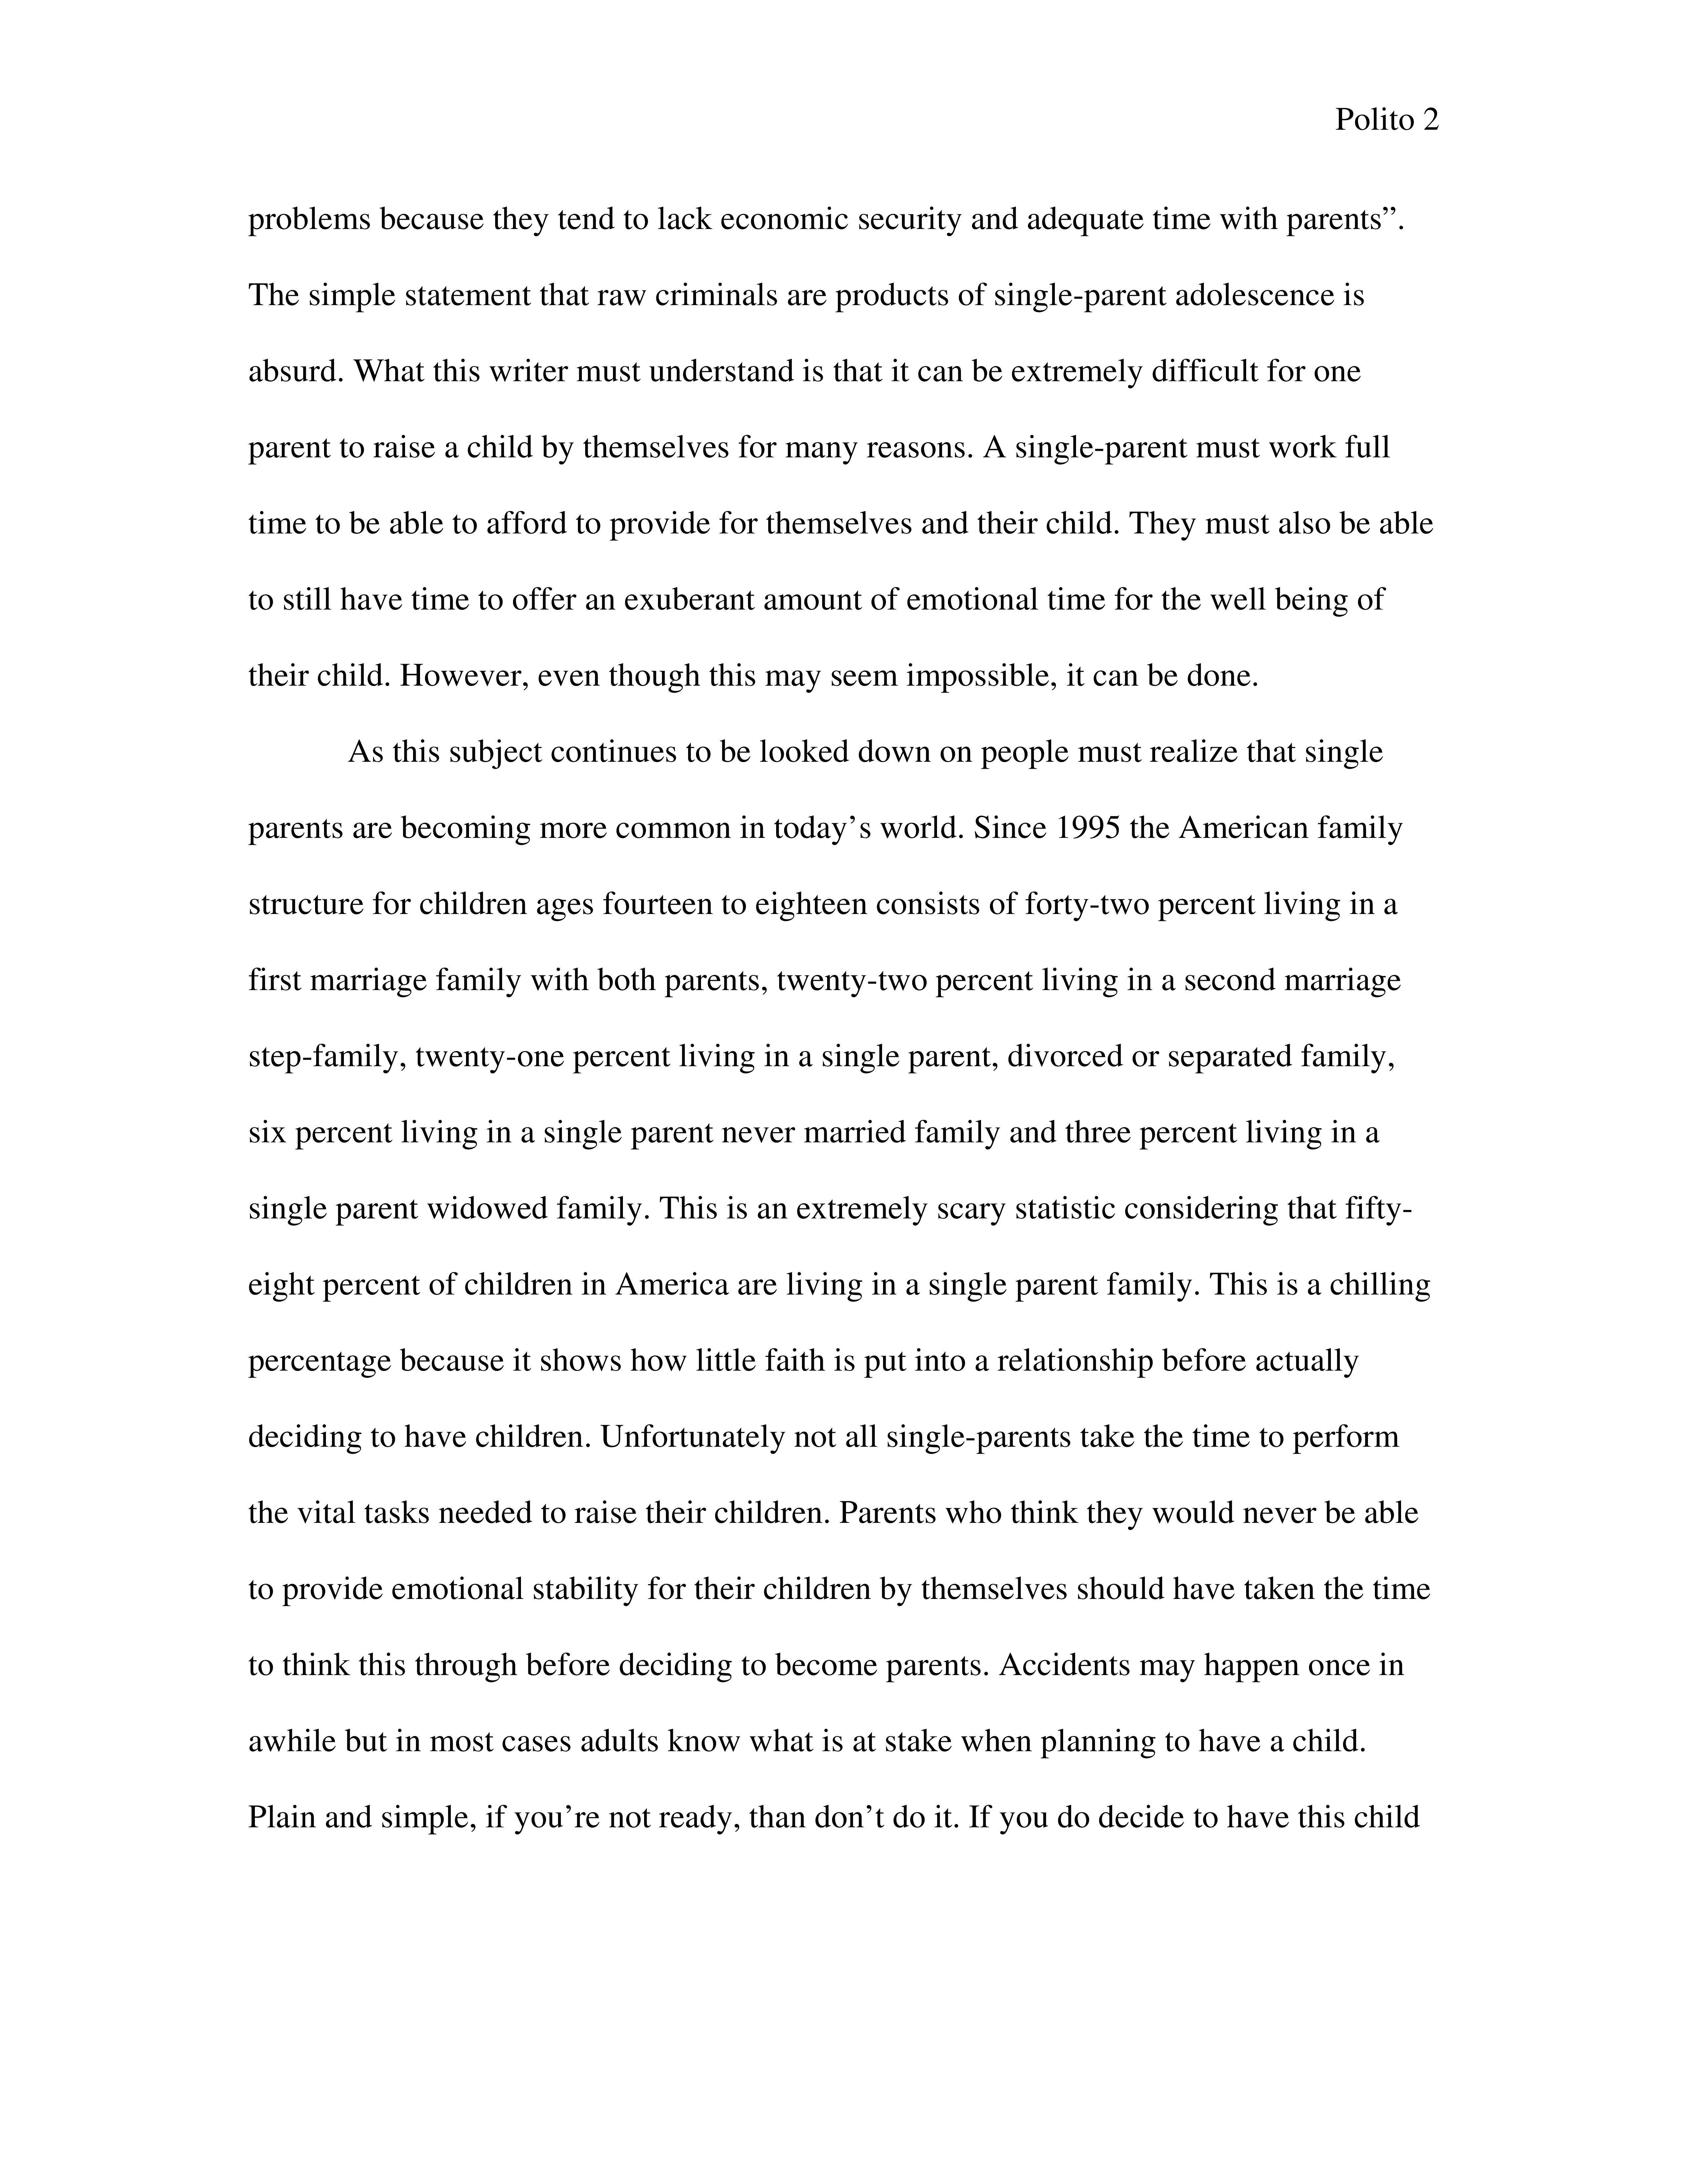 Afsa high school essay contest 2014